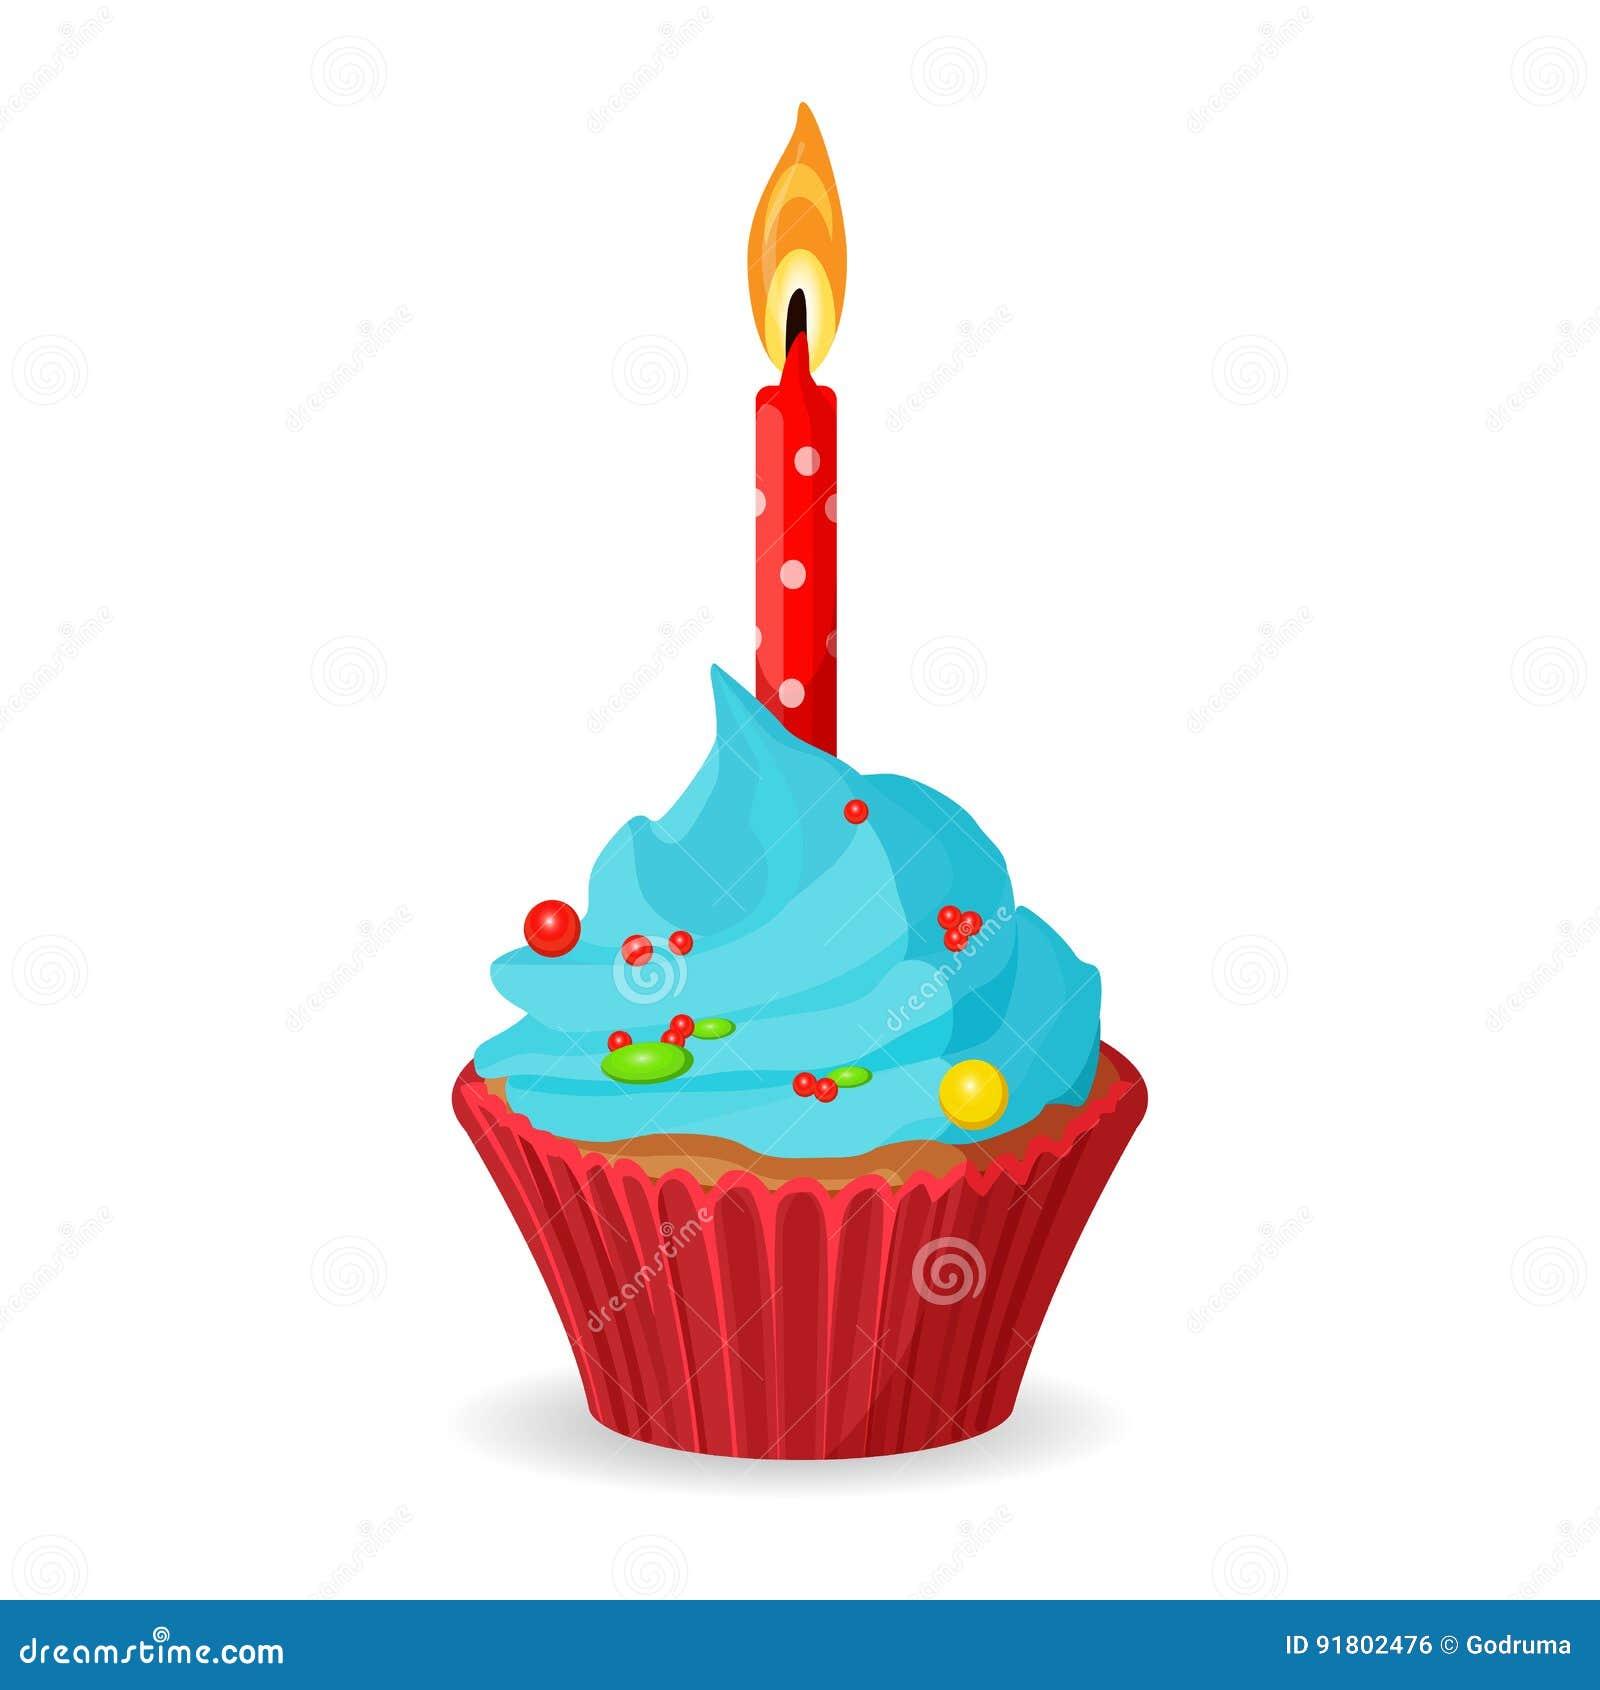 Birthday Cupcake With One Burning Candle Blue Cream Caramel